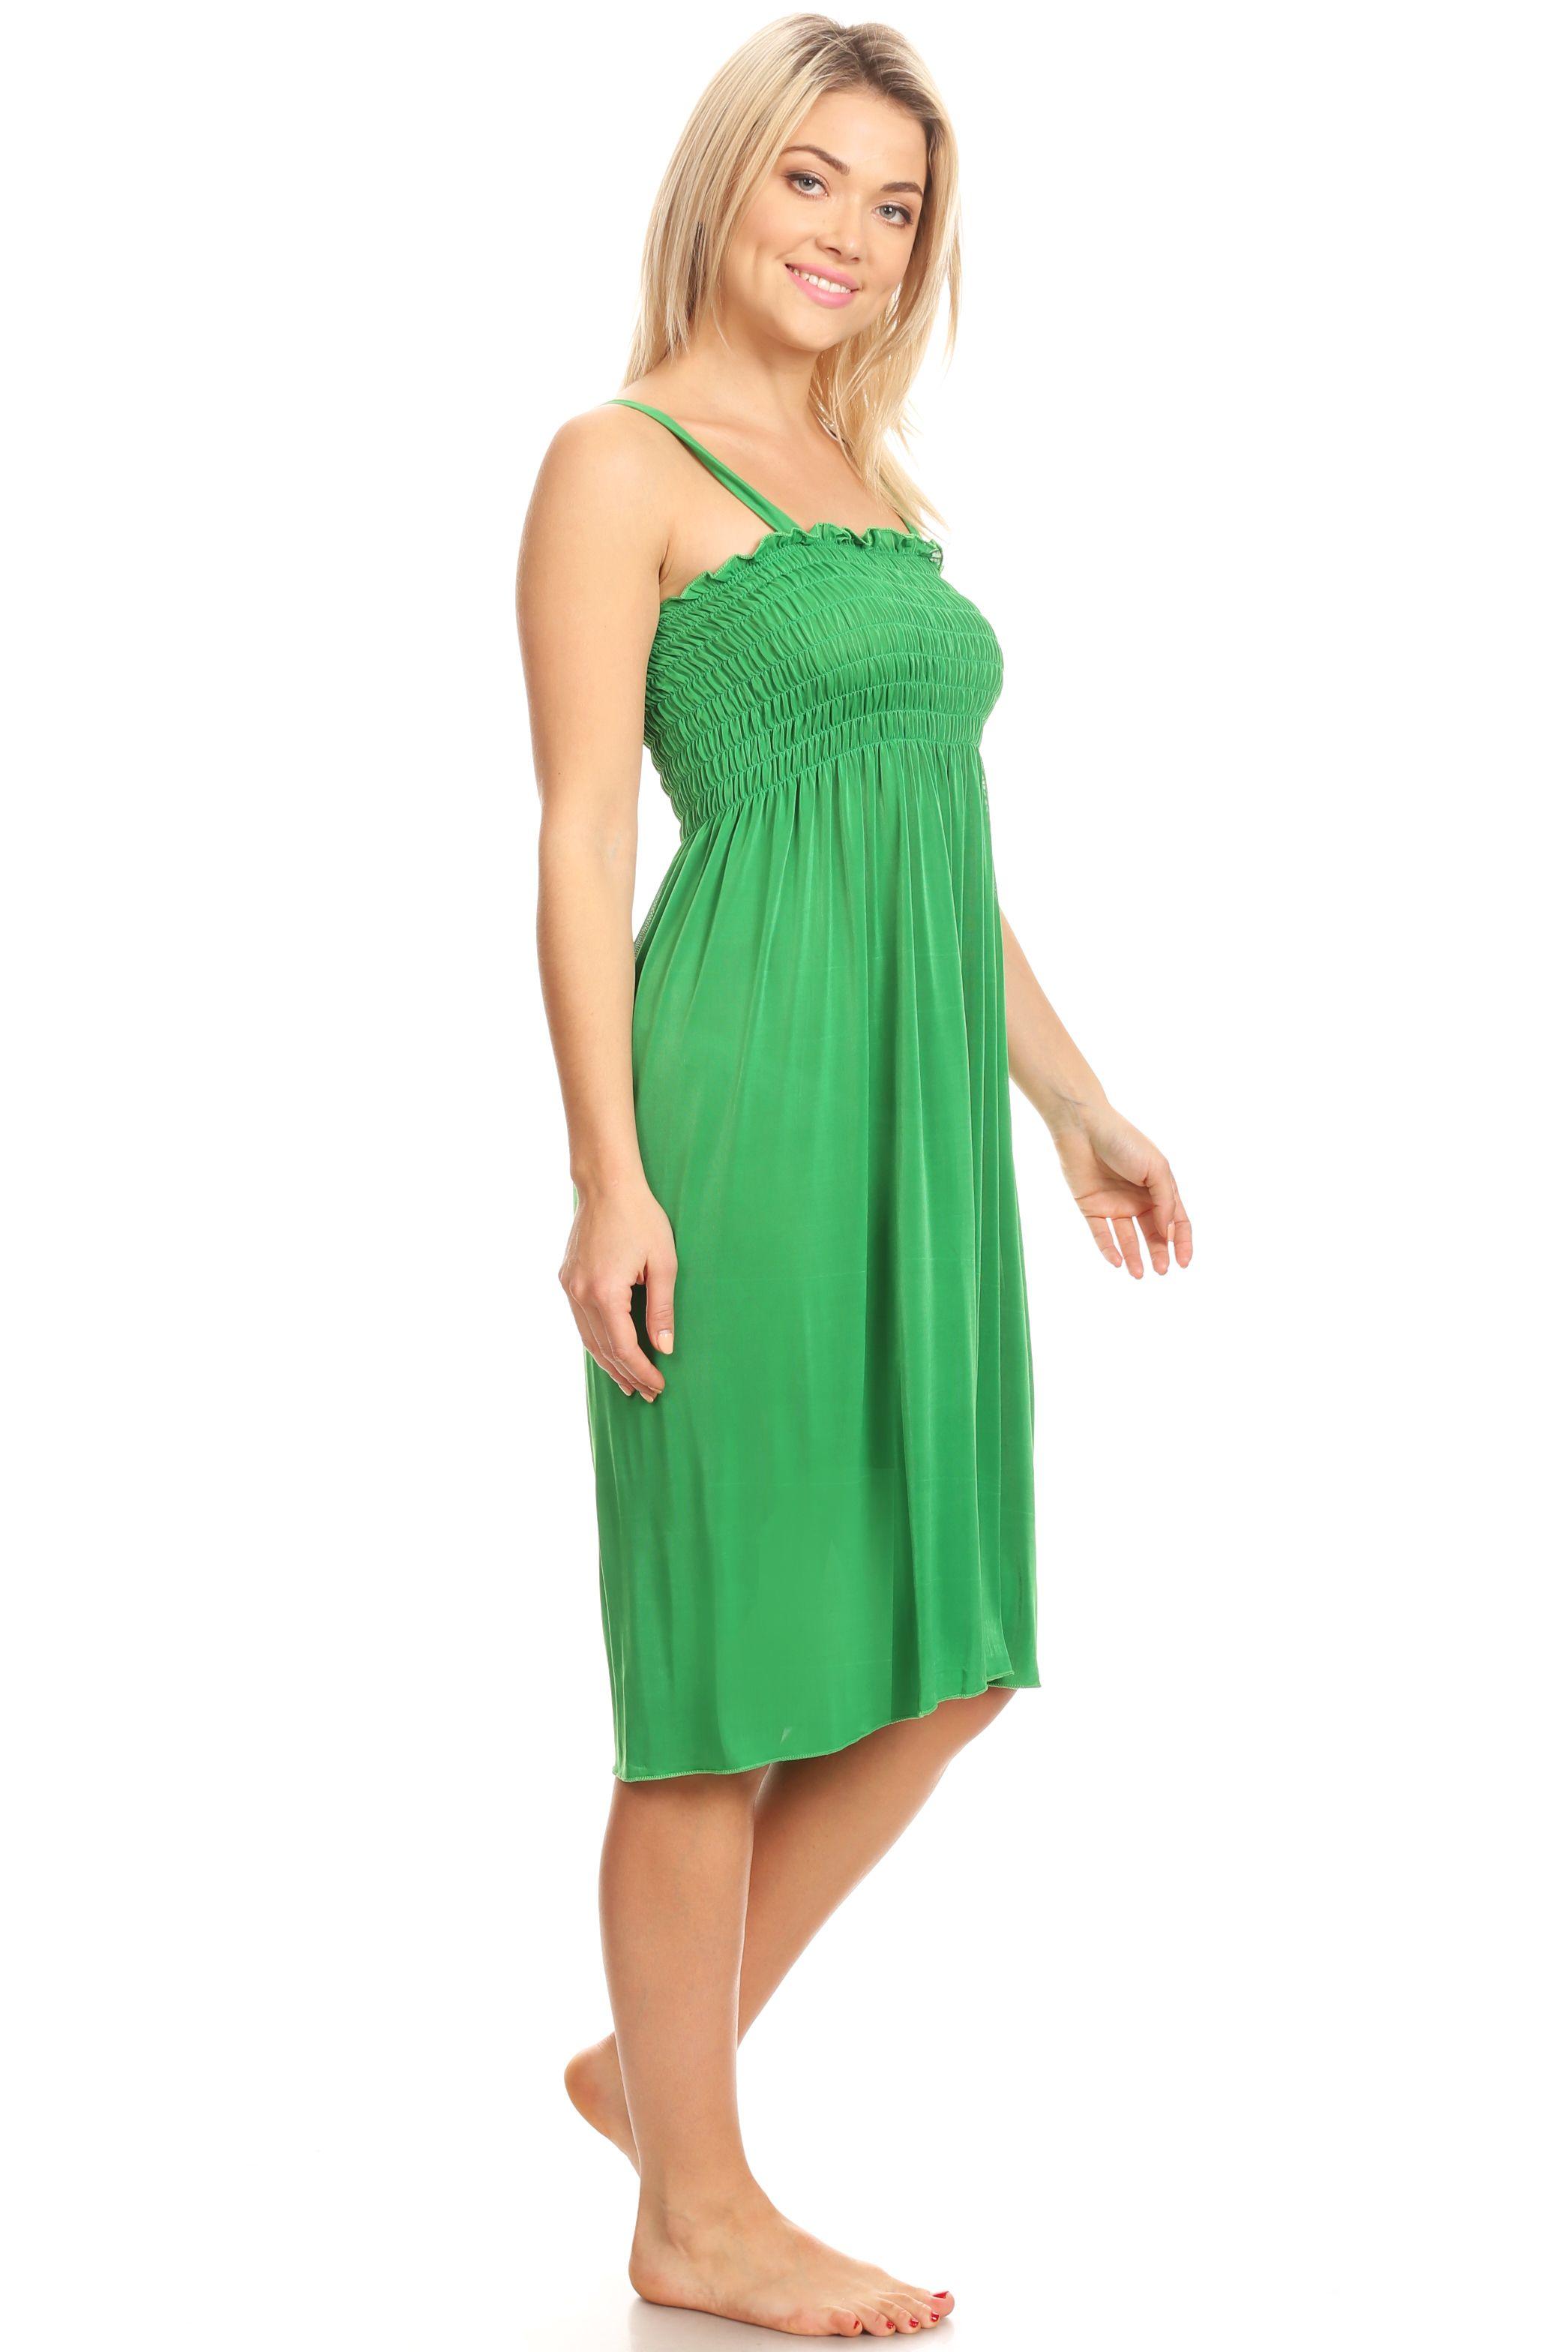 Lati Fashion Sd005 Sun Dress Beach Cover Up Stretch Knee High Tank Top Walmart Com Beach Dresses Dresses Fashion [ 3136 x 2091 Pixel ]